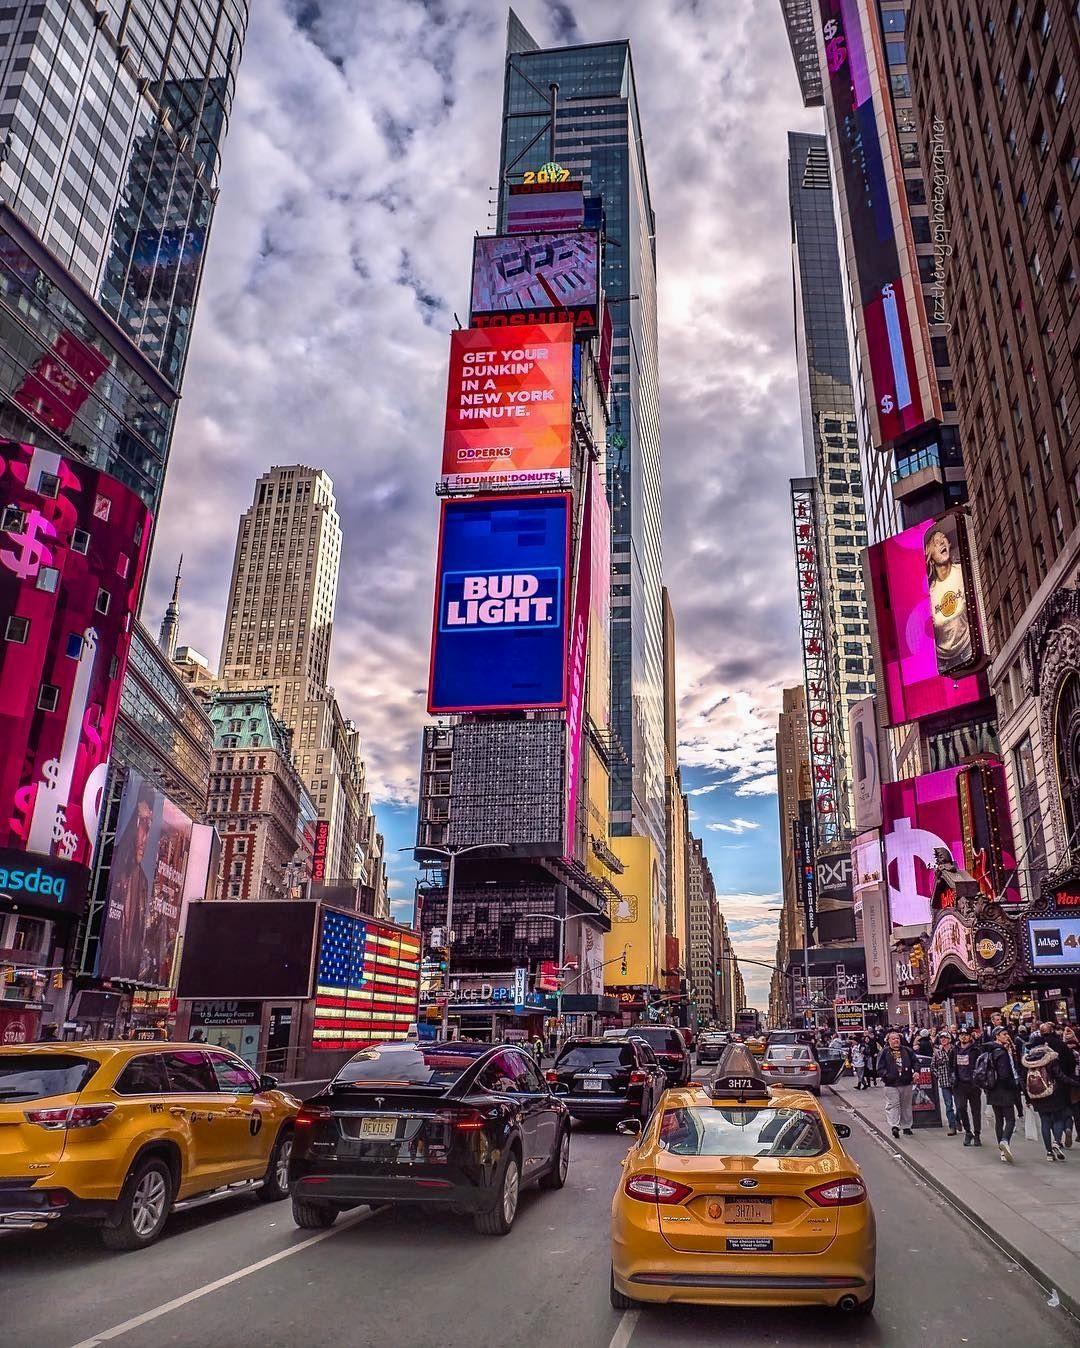 #newyork #newyorkcity #nyc #manhattan #timessquare